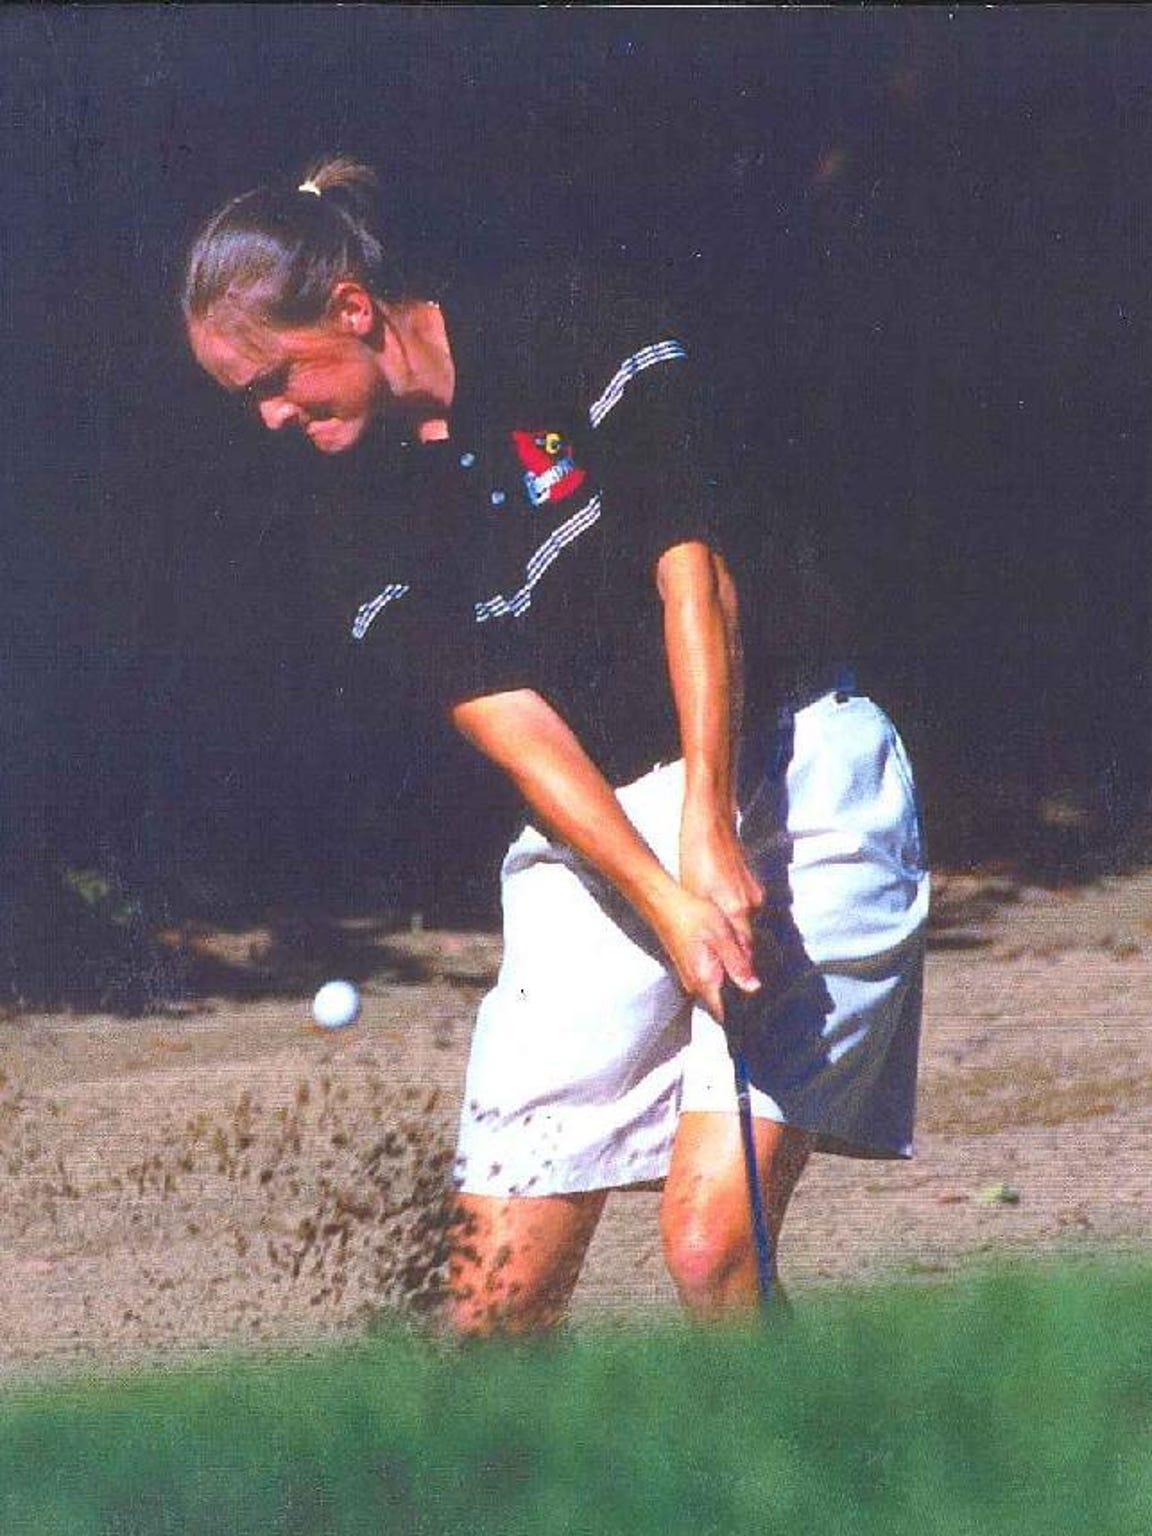 Mowat playing golf at Louisville.